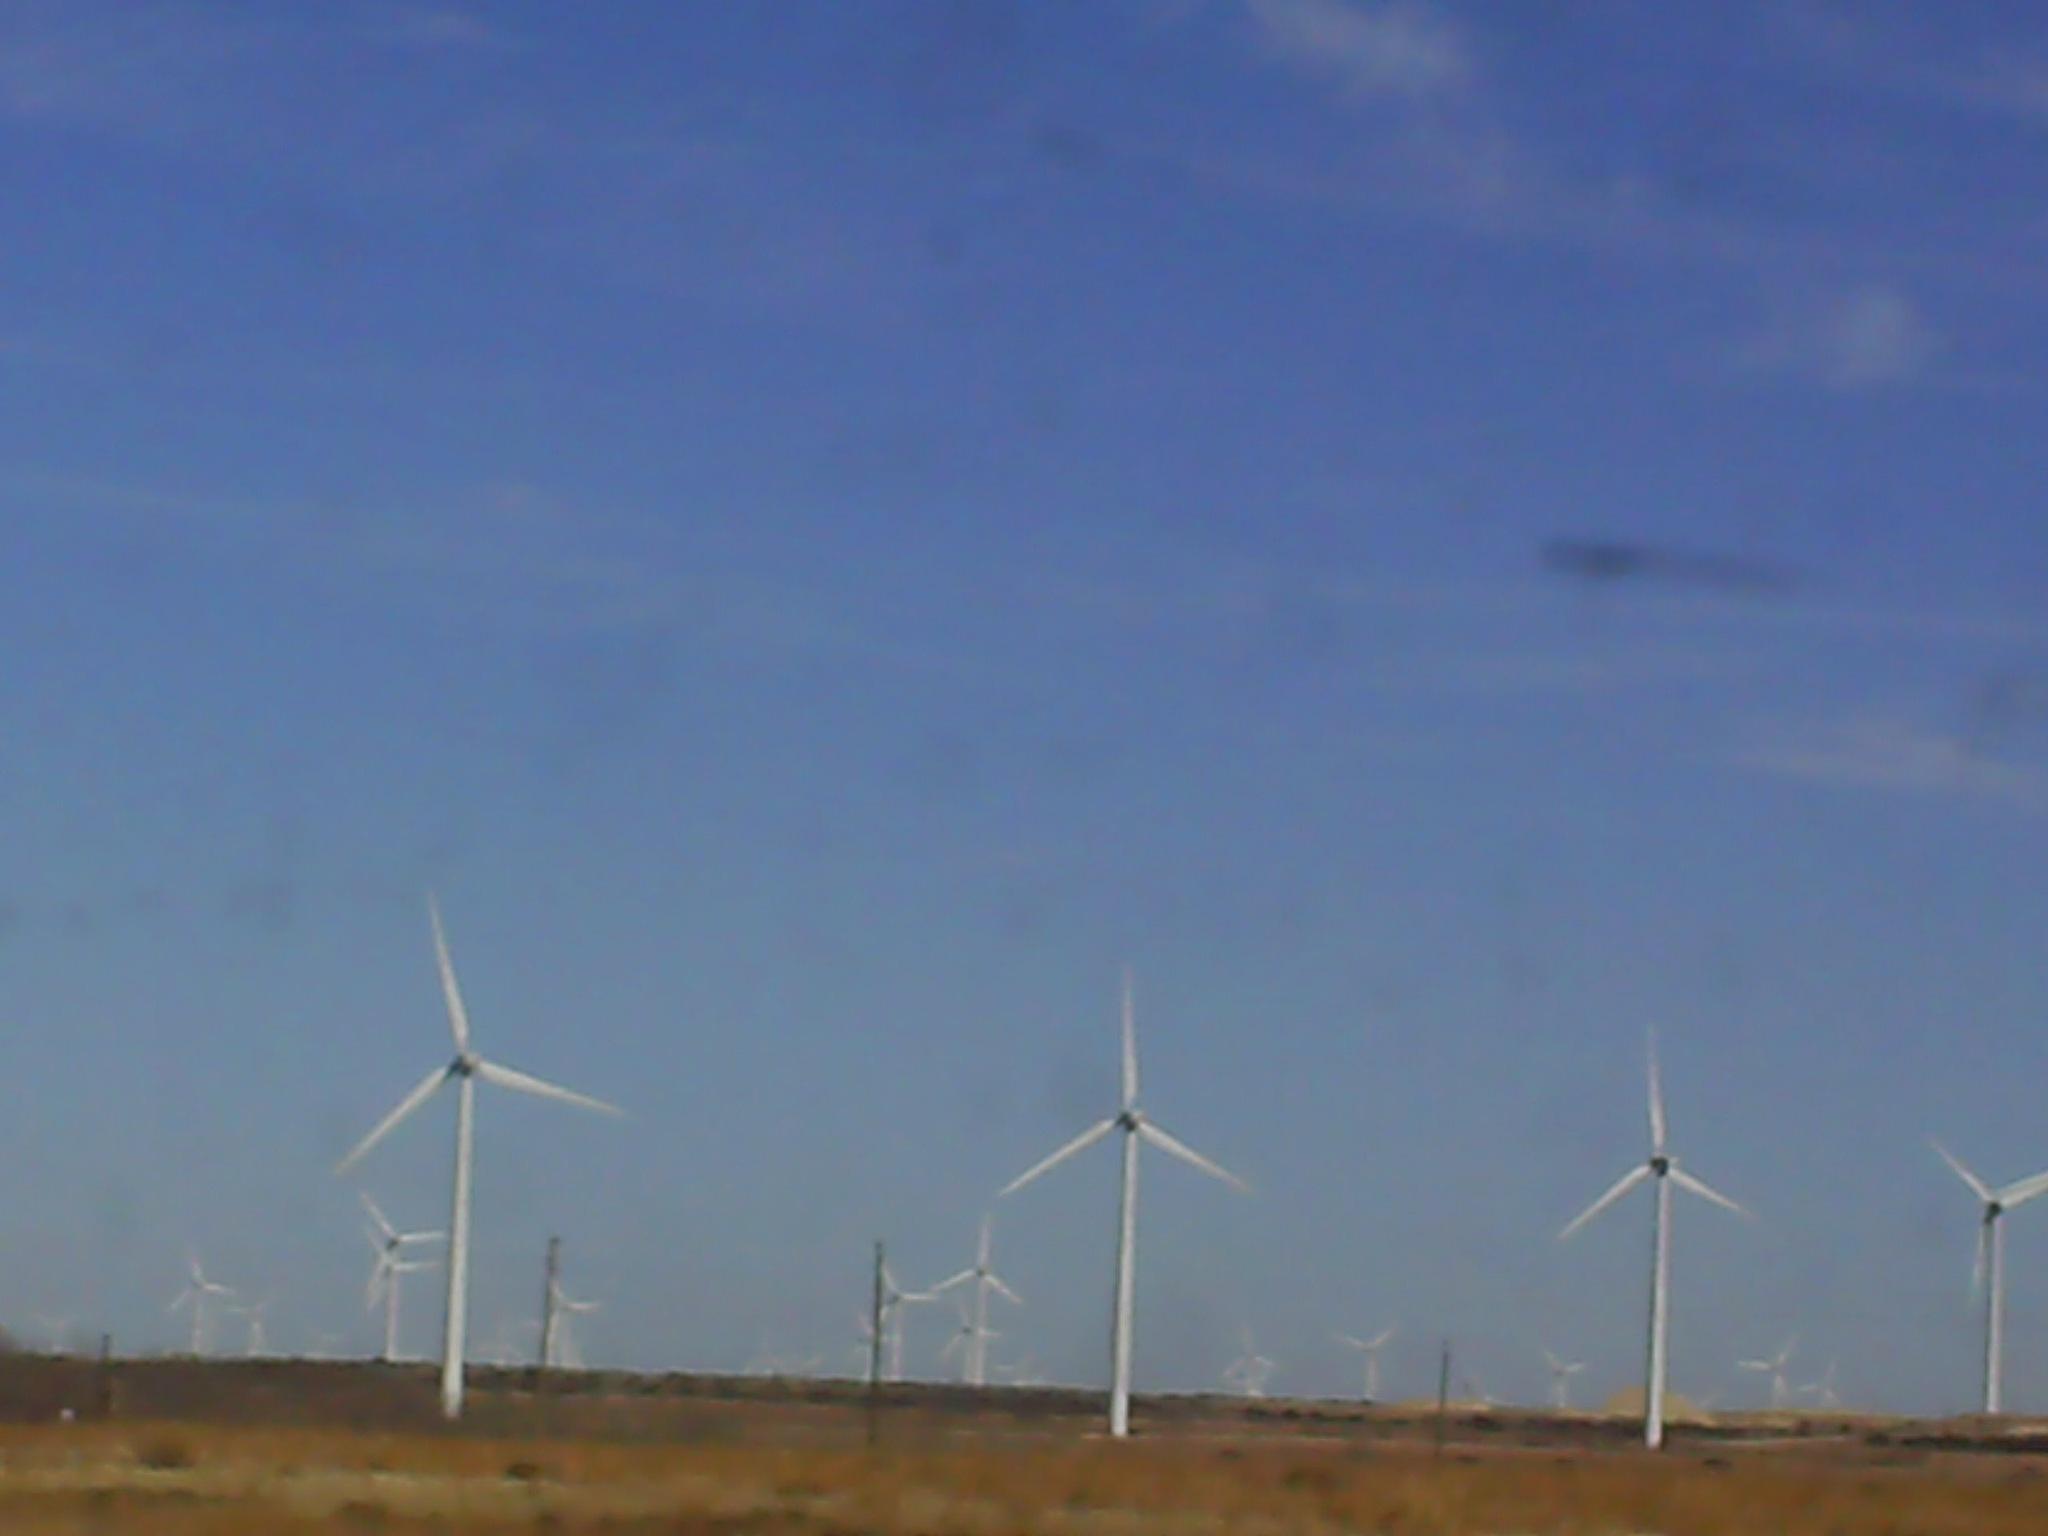 Windmills by john.fisher.7315